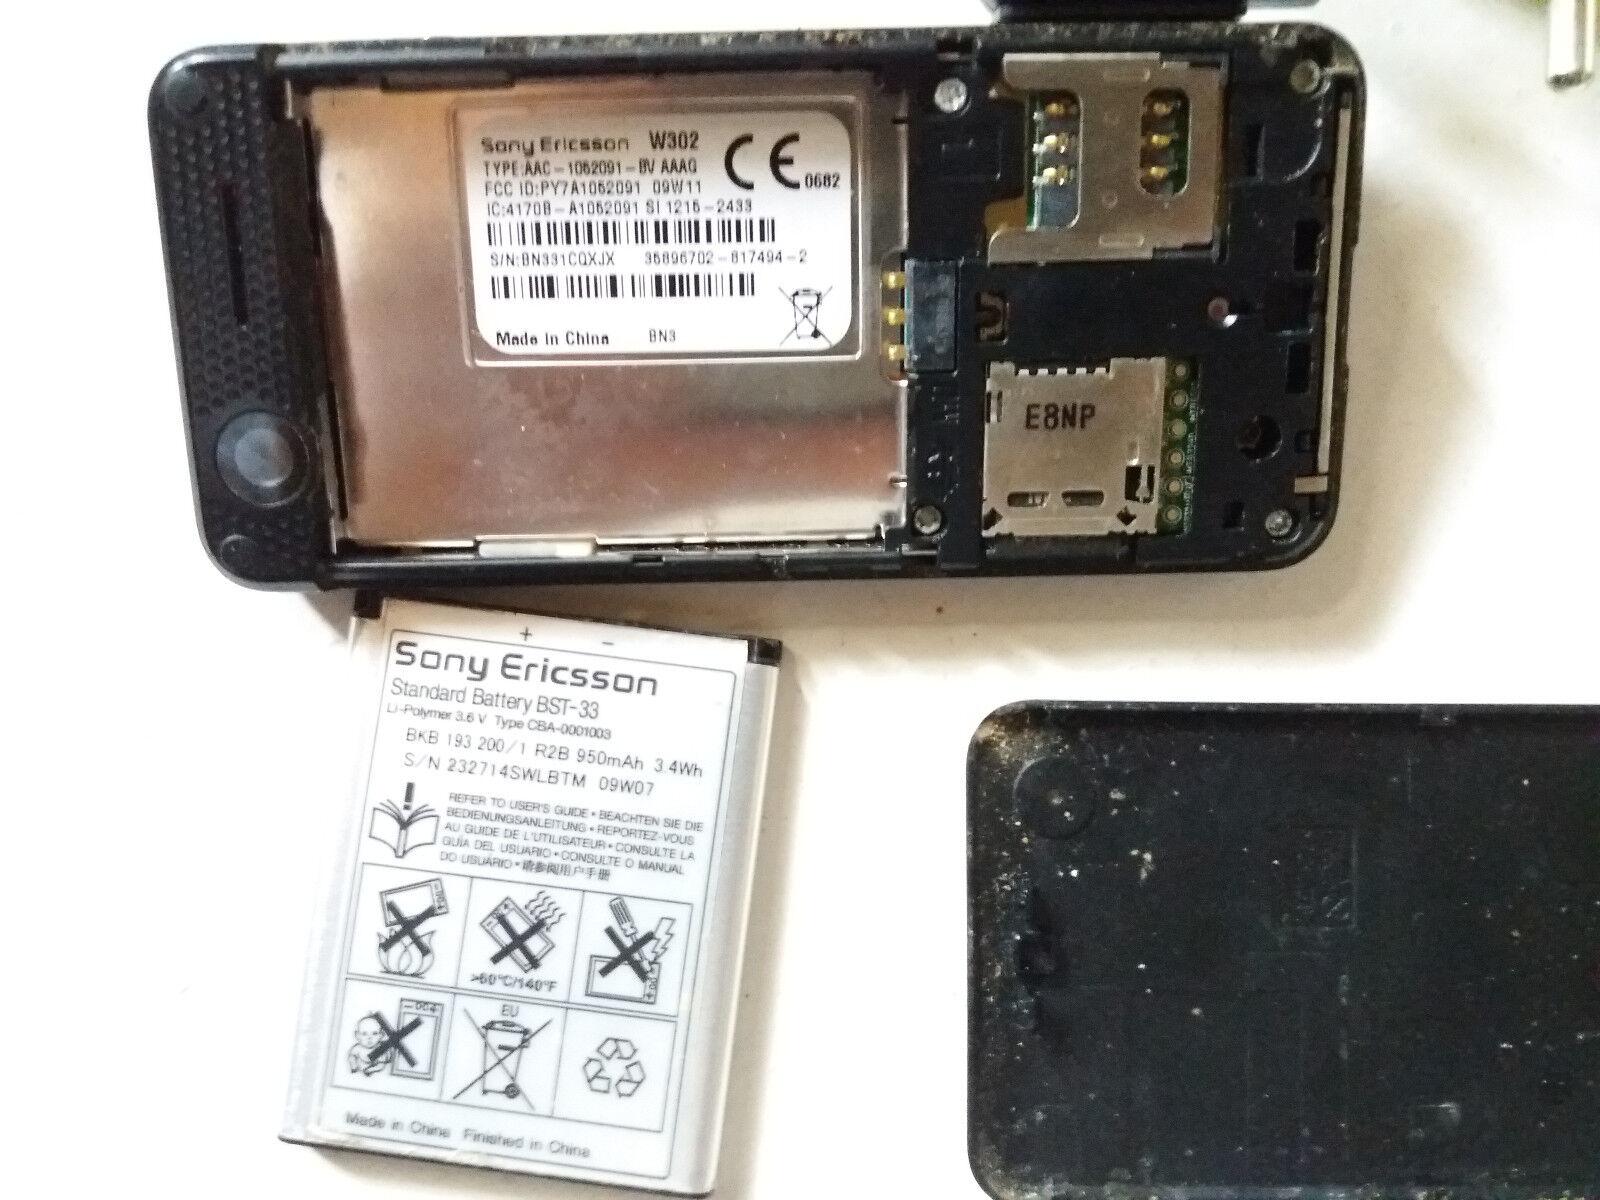 sony ericsson sony ericcson walkman w302 midnight black unlocked rh ebay com Sony Ericsson Mobile Phones Sony Ericsson Phones